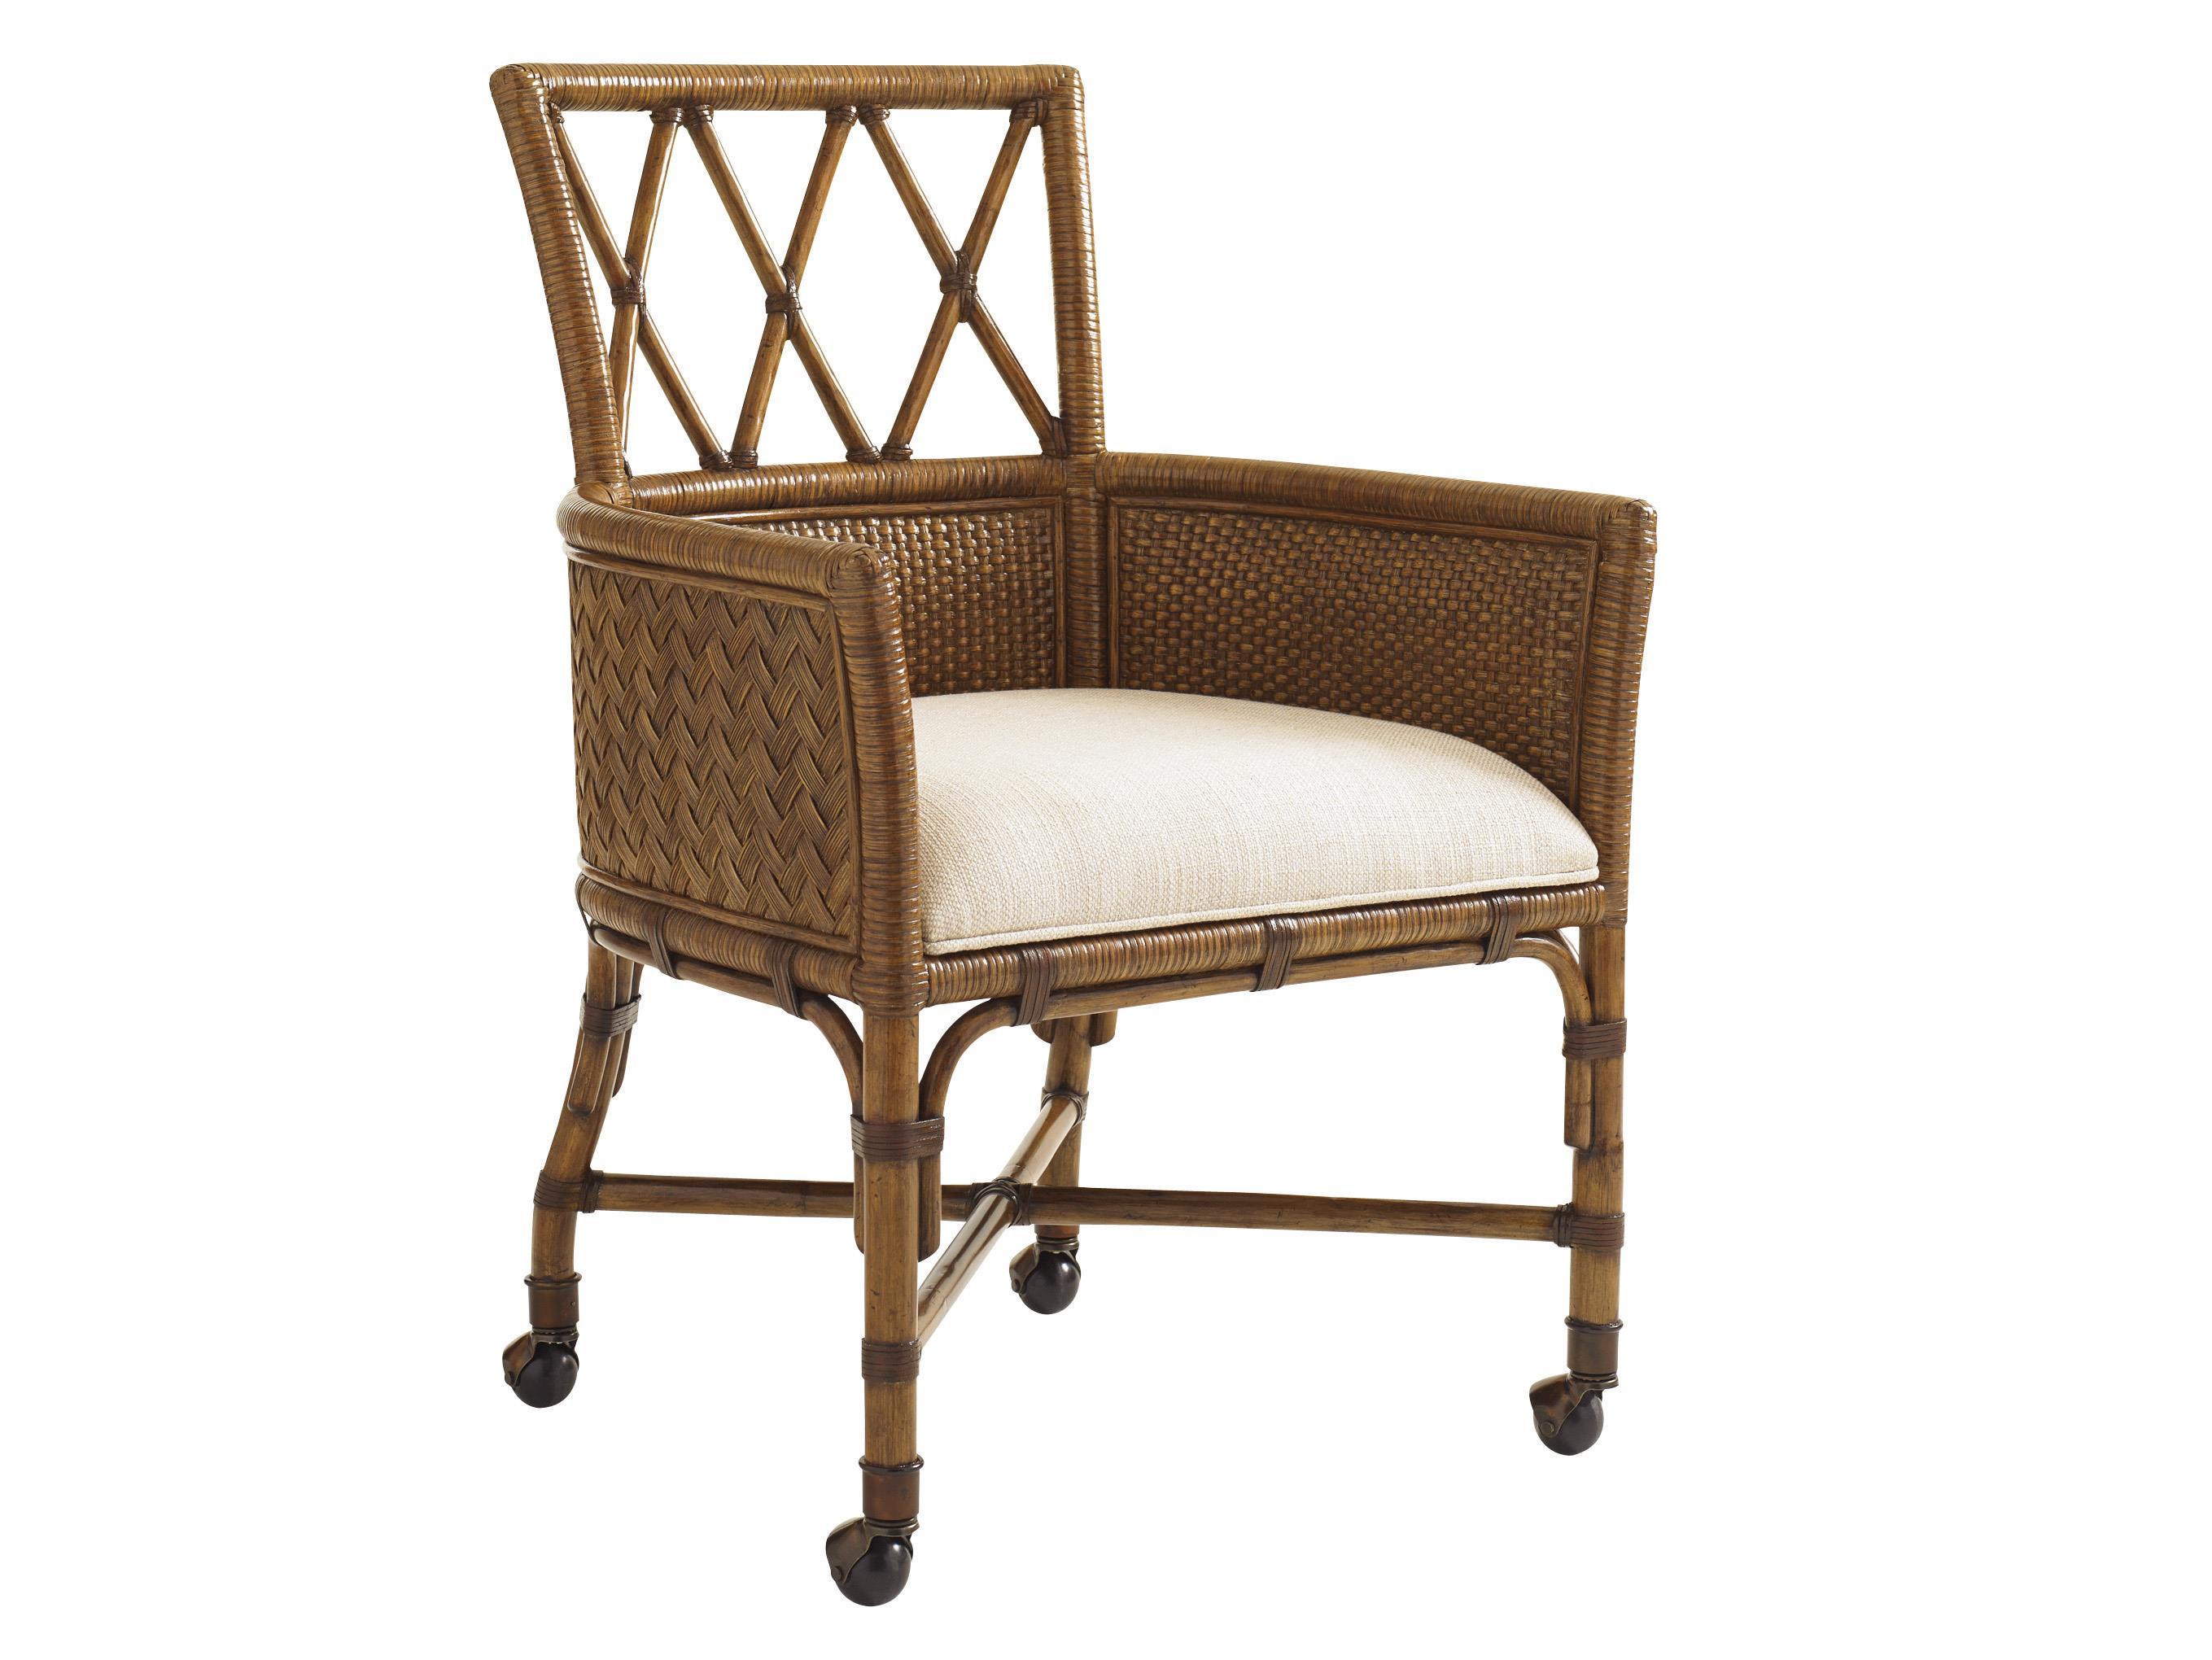 Bali Hai Quickship Tarpon Cove Game Chair by Tommy Bahama Home at Baer's Furniture